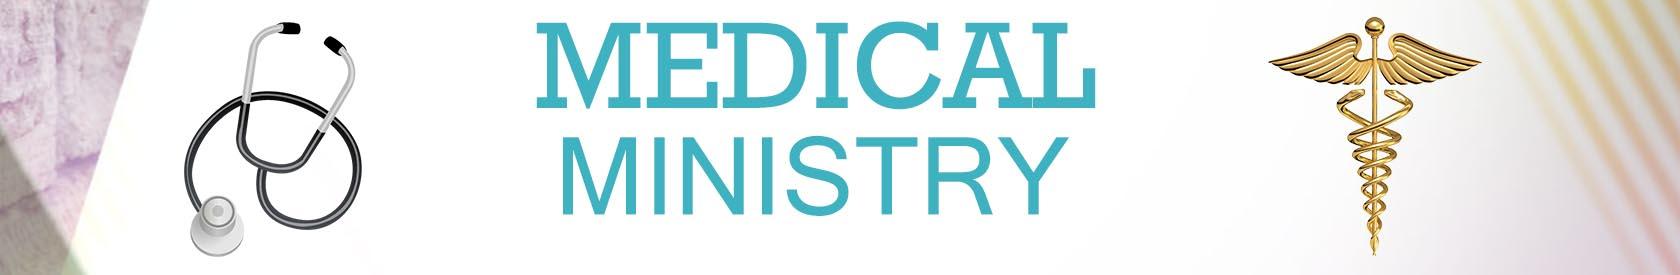 MEDICALS